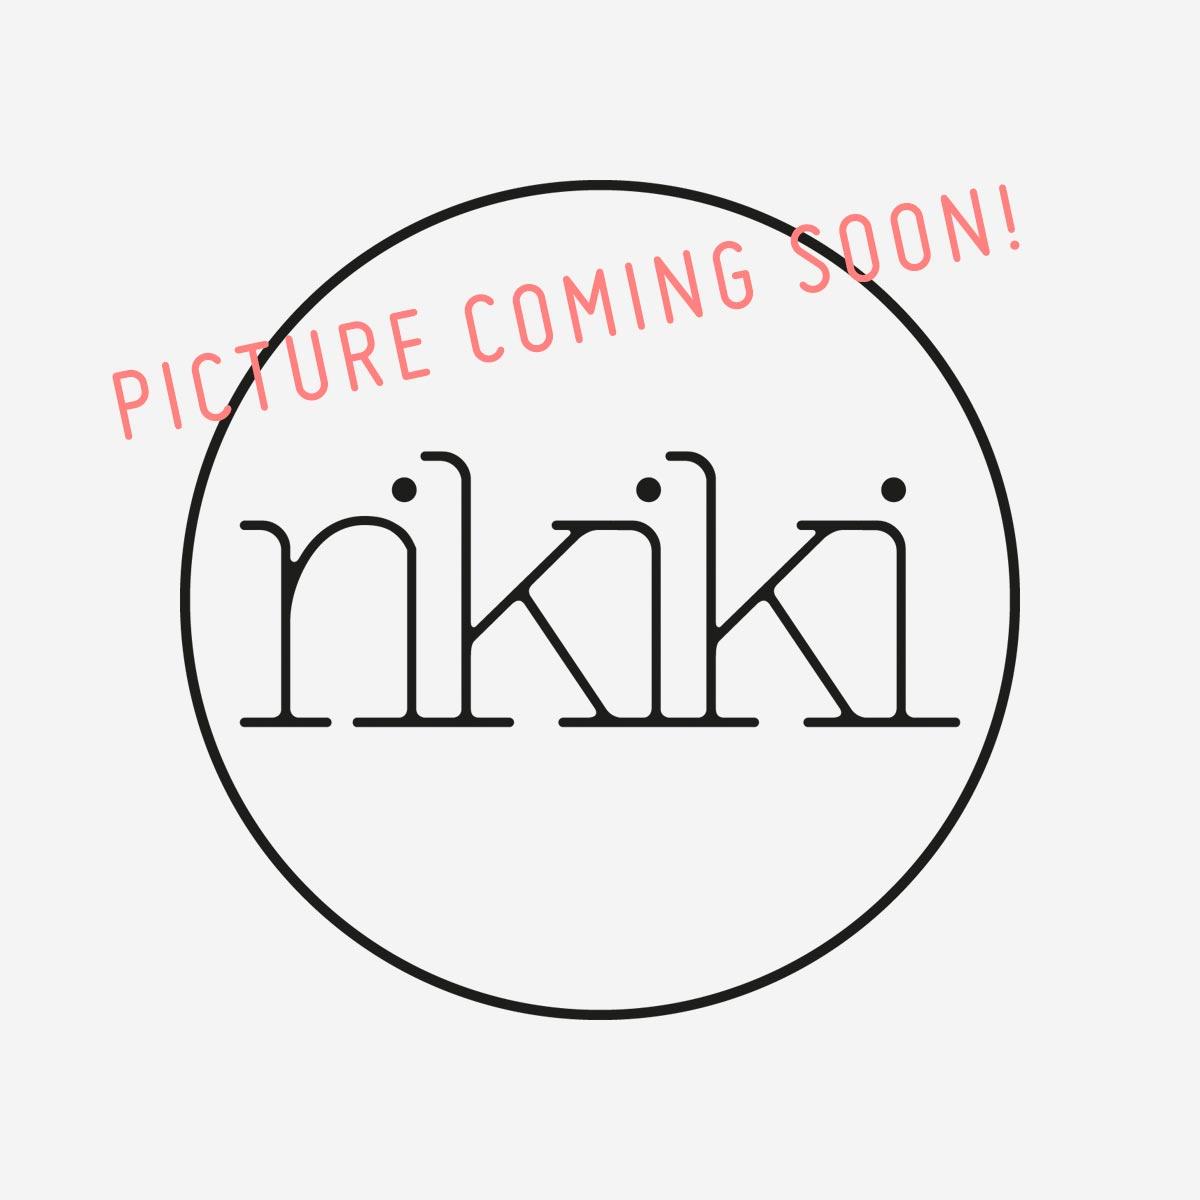 Rikiki grafik produkt loop corolle 94 cm wall shelf petite friture loop corolle 94 cm wall shelf ccuart Images